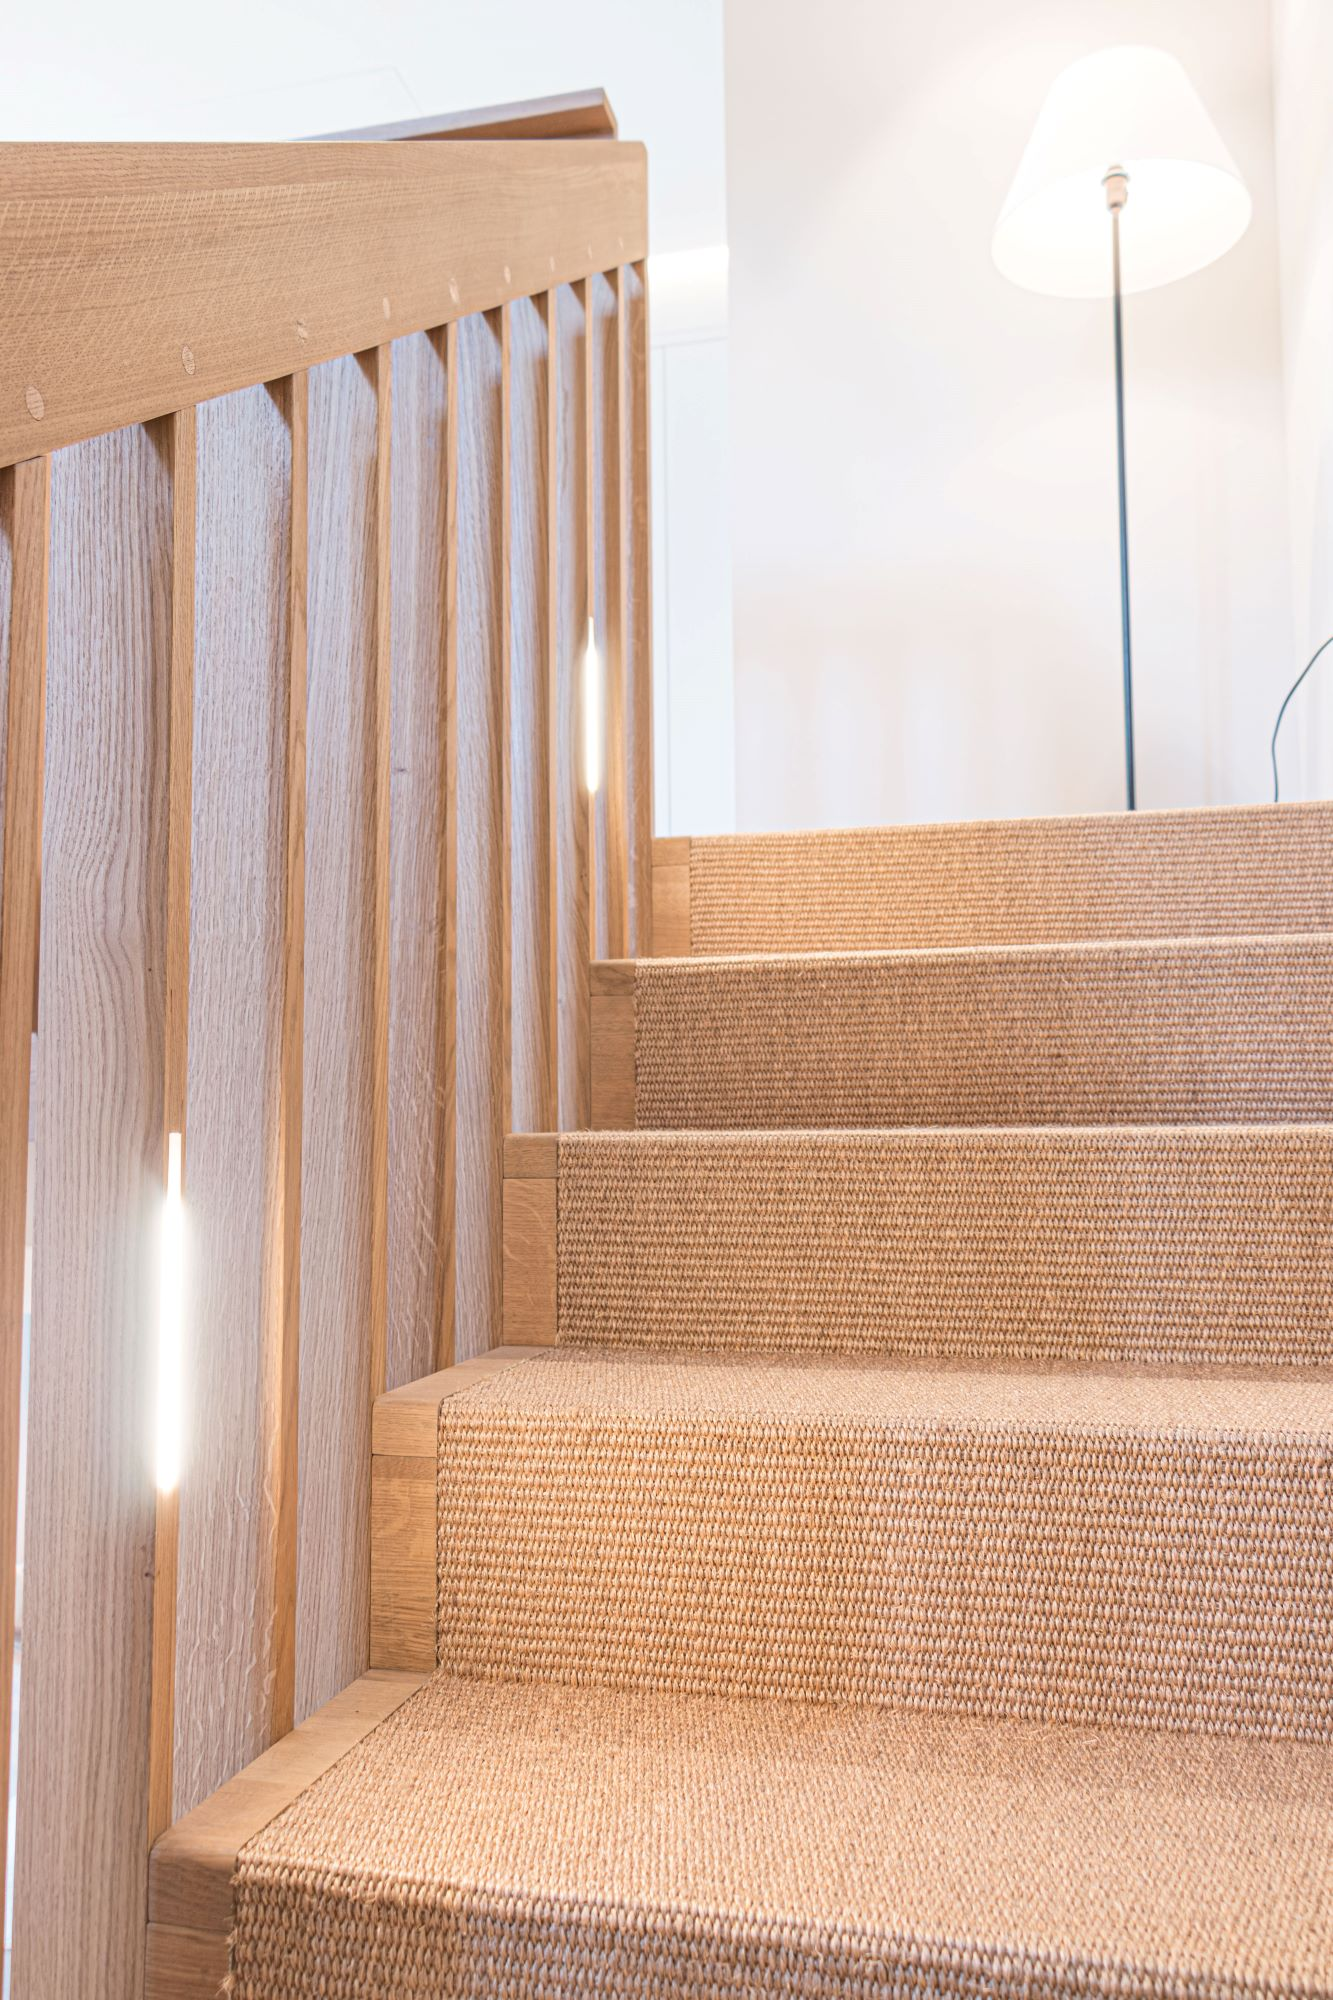 Stair Image 2302